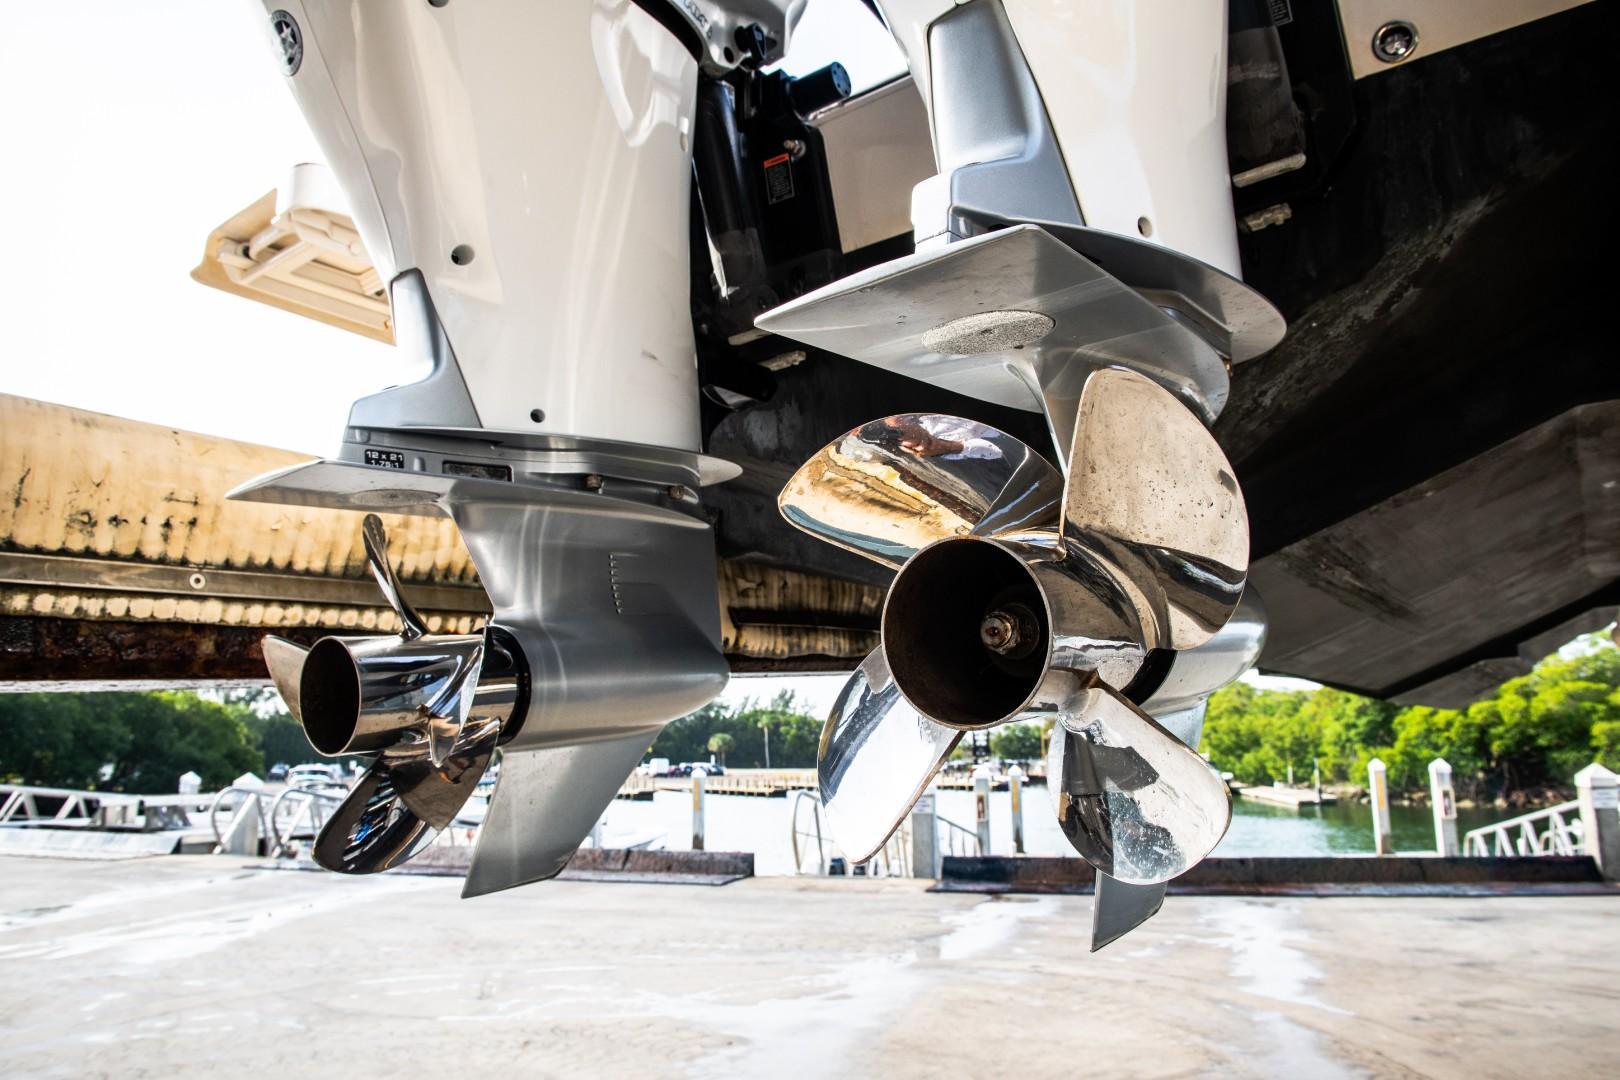 Intrepid 32 - Next Edition - Engines